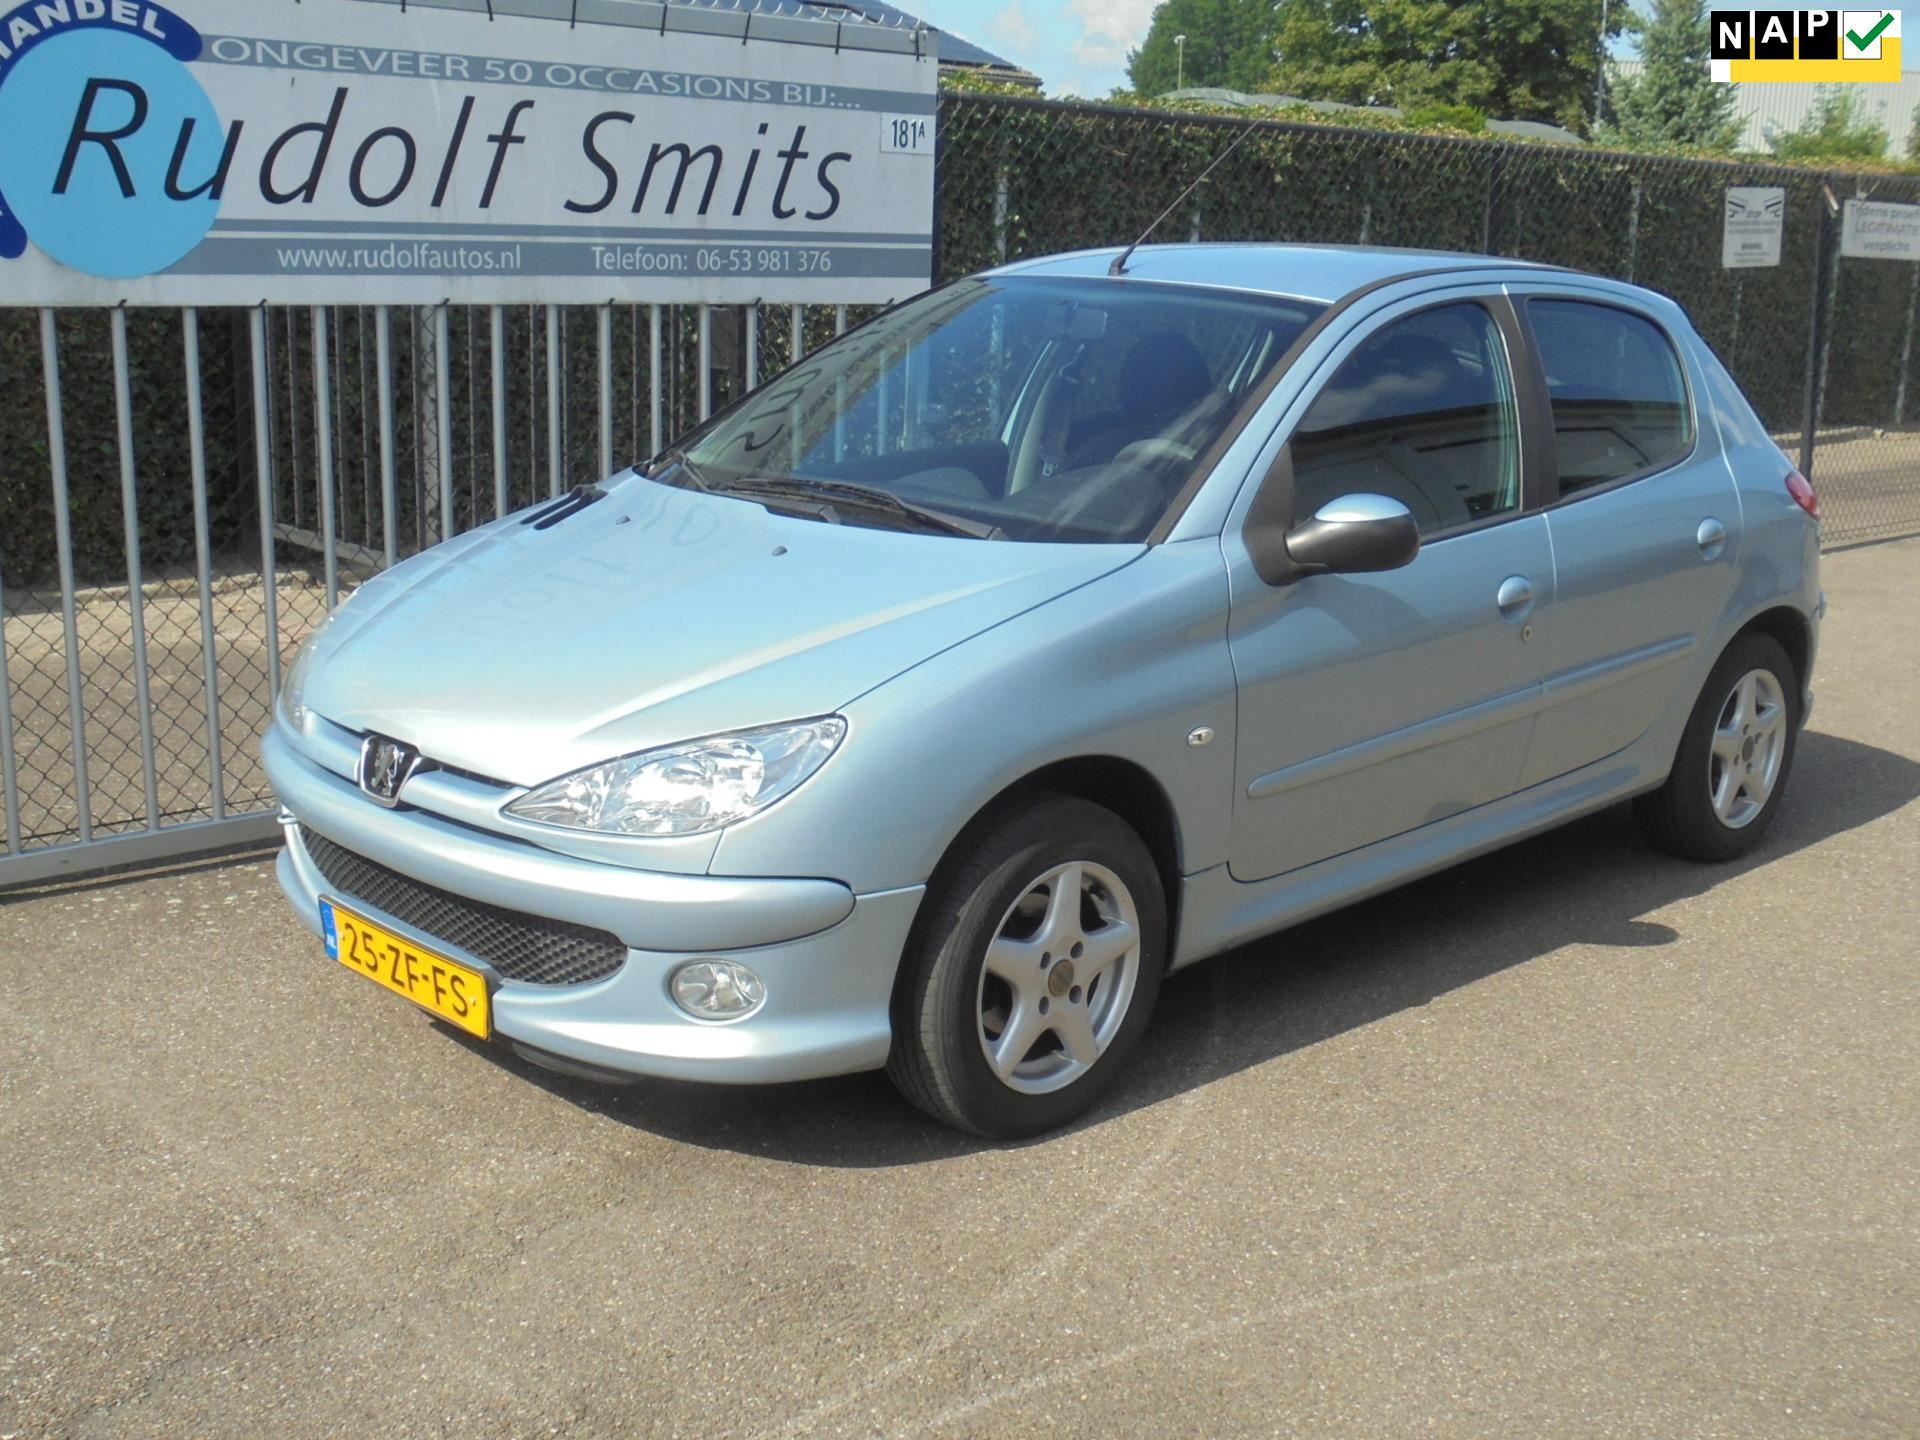 Peugeot 206 occasion - Autohandel Rudolf Smits